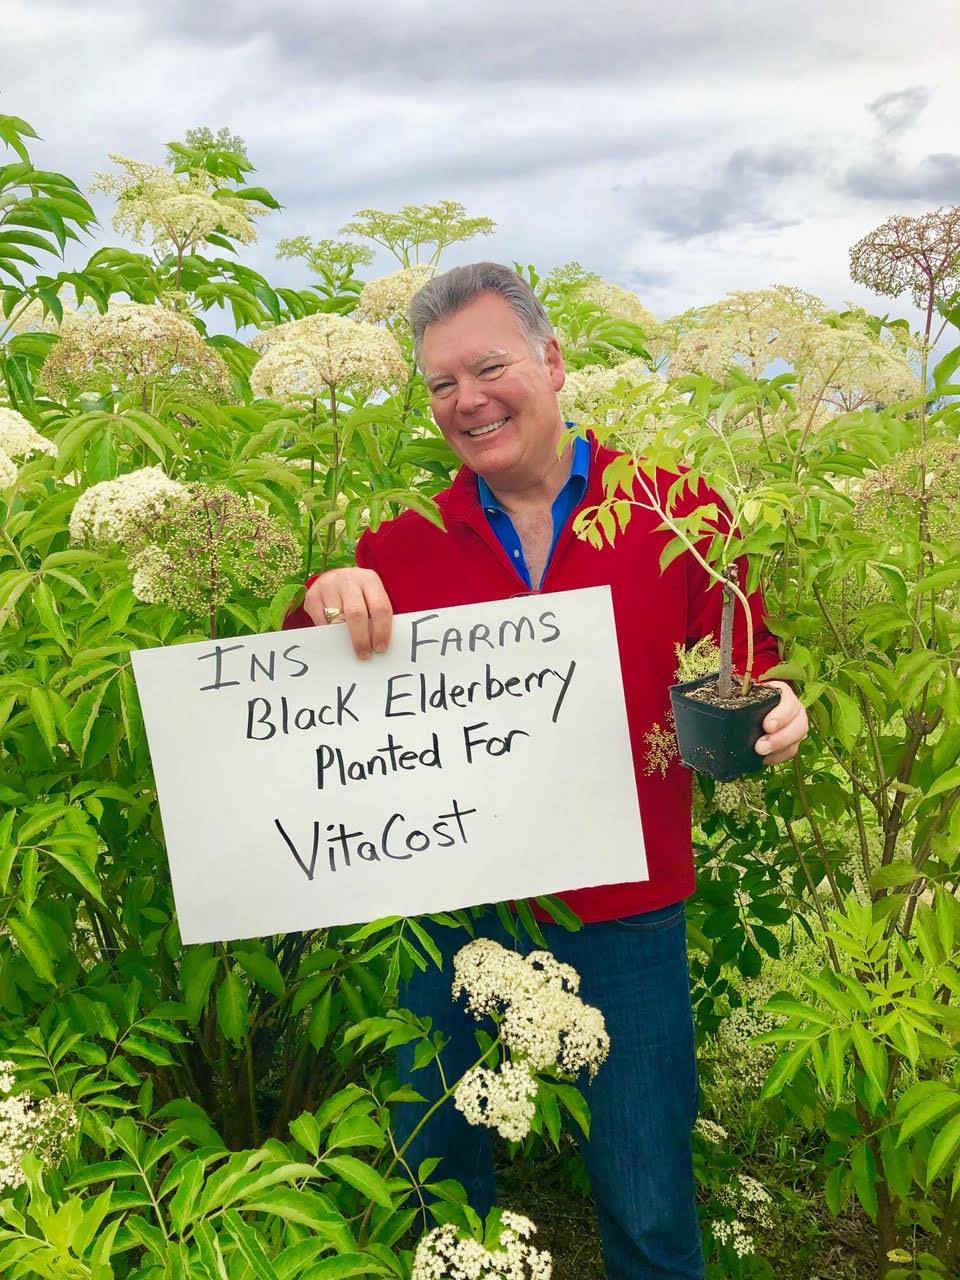 Plant-Elderberry-VitaCost.jpg